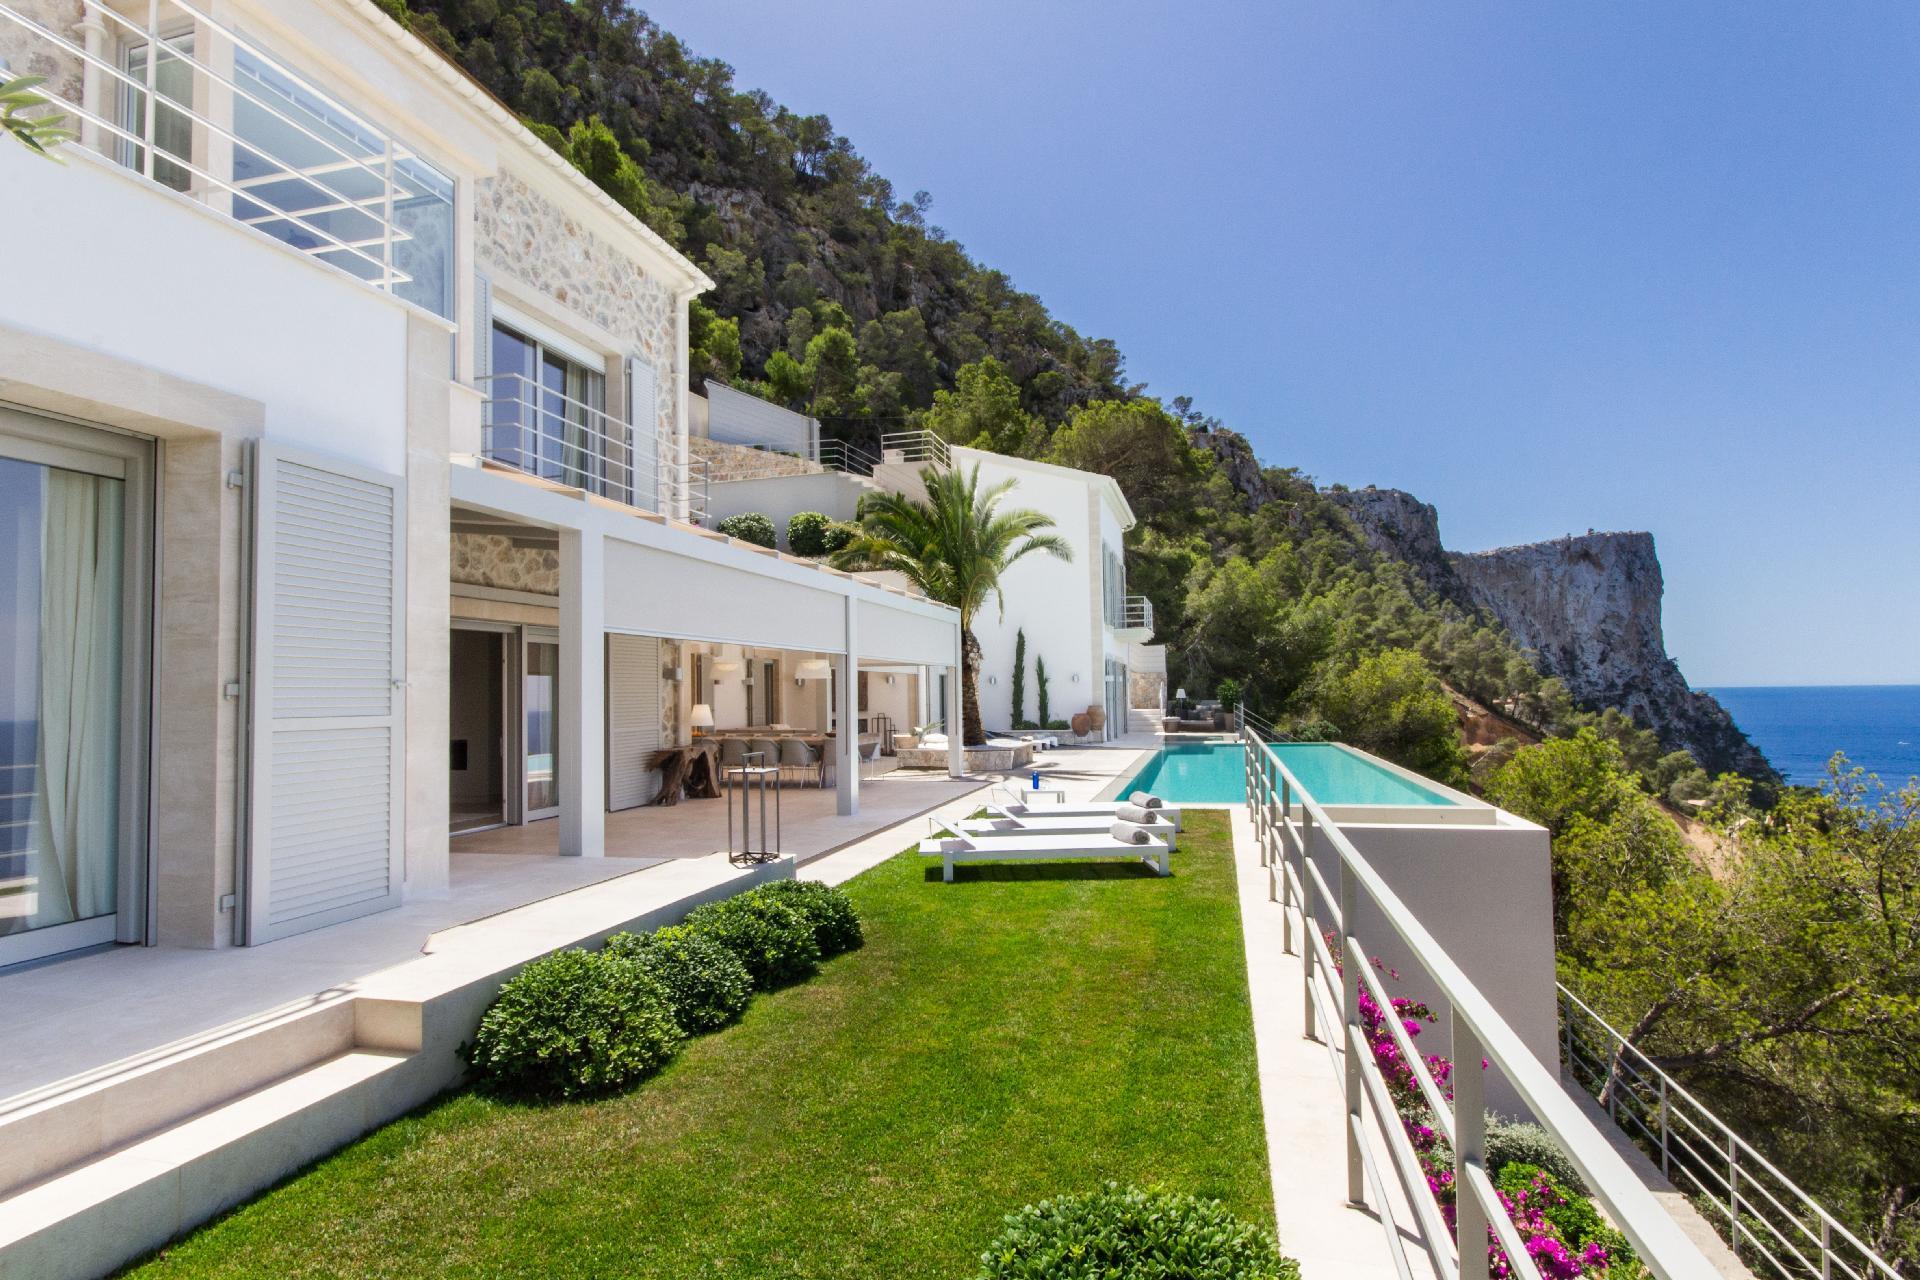 Ferienhaus mit Privatpool für 12 Personen ca 875 m² in Port d Andratx Mallorca Südwestküste von Mallorca